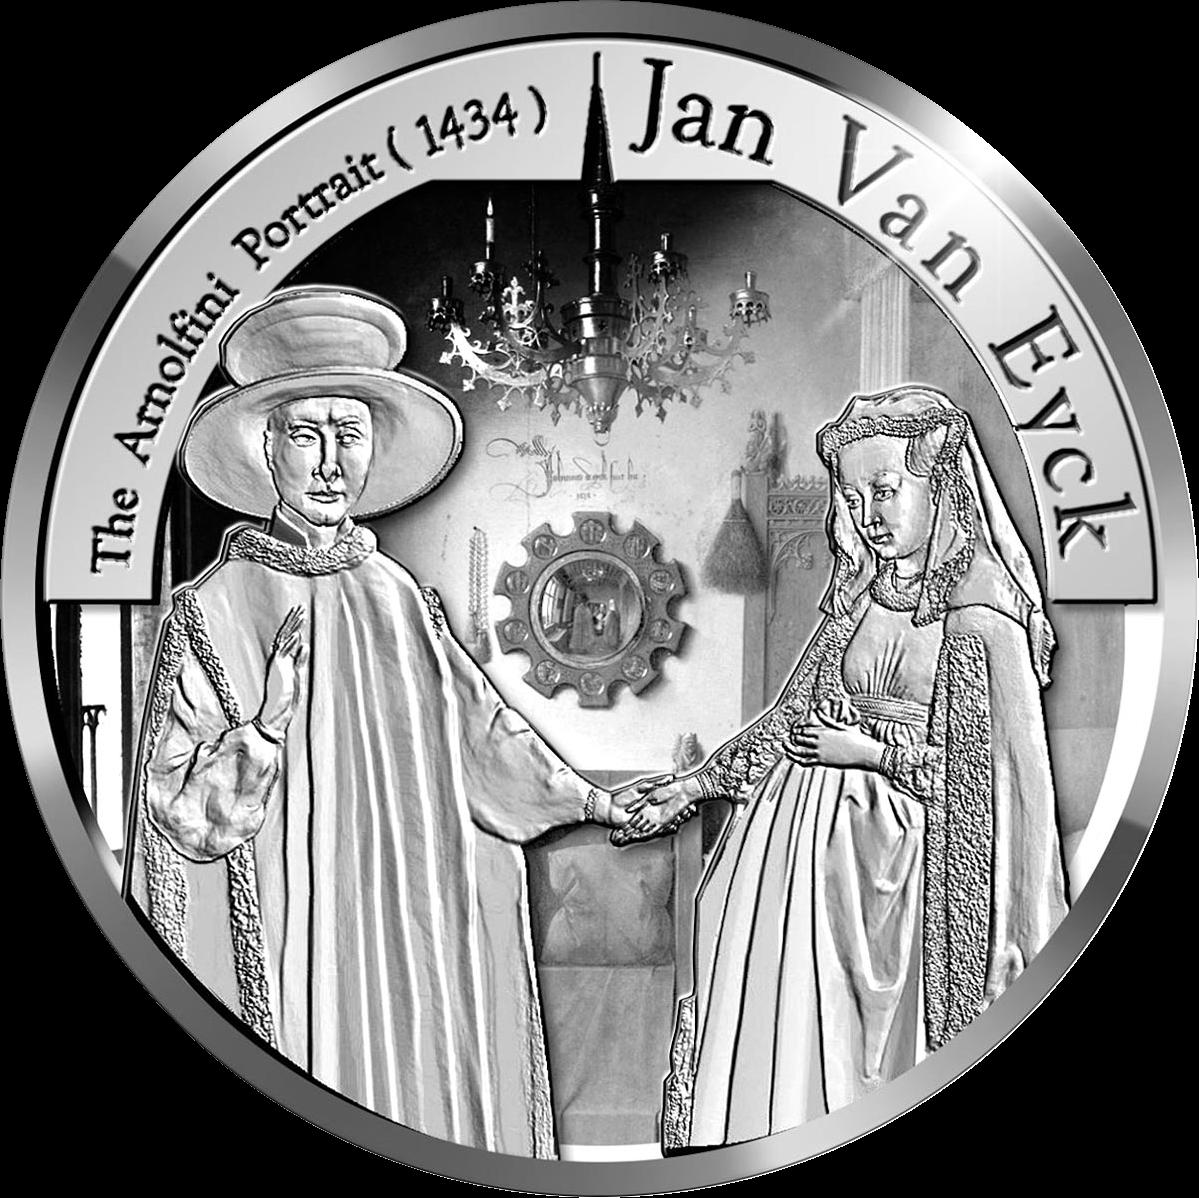 Бельгия монета 10 евро Ян ван Эйк, реверс